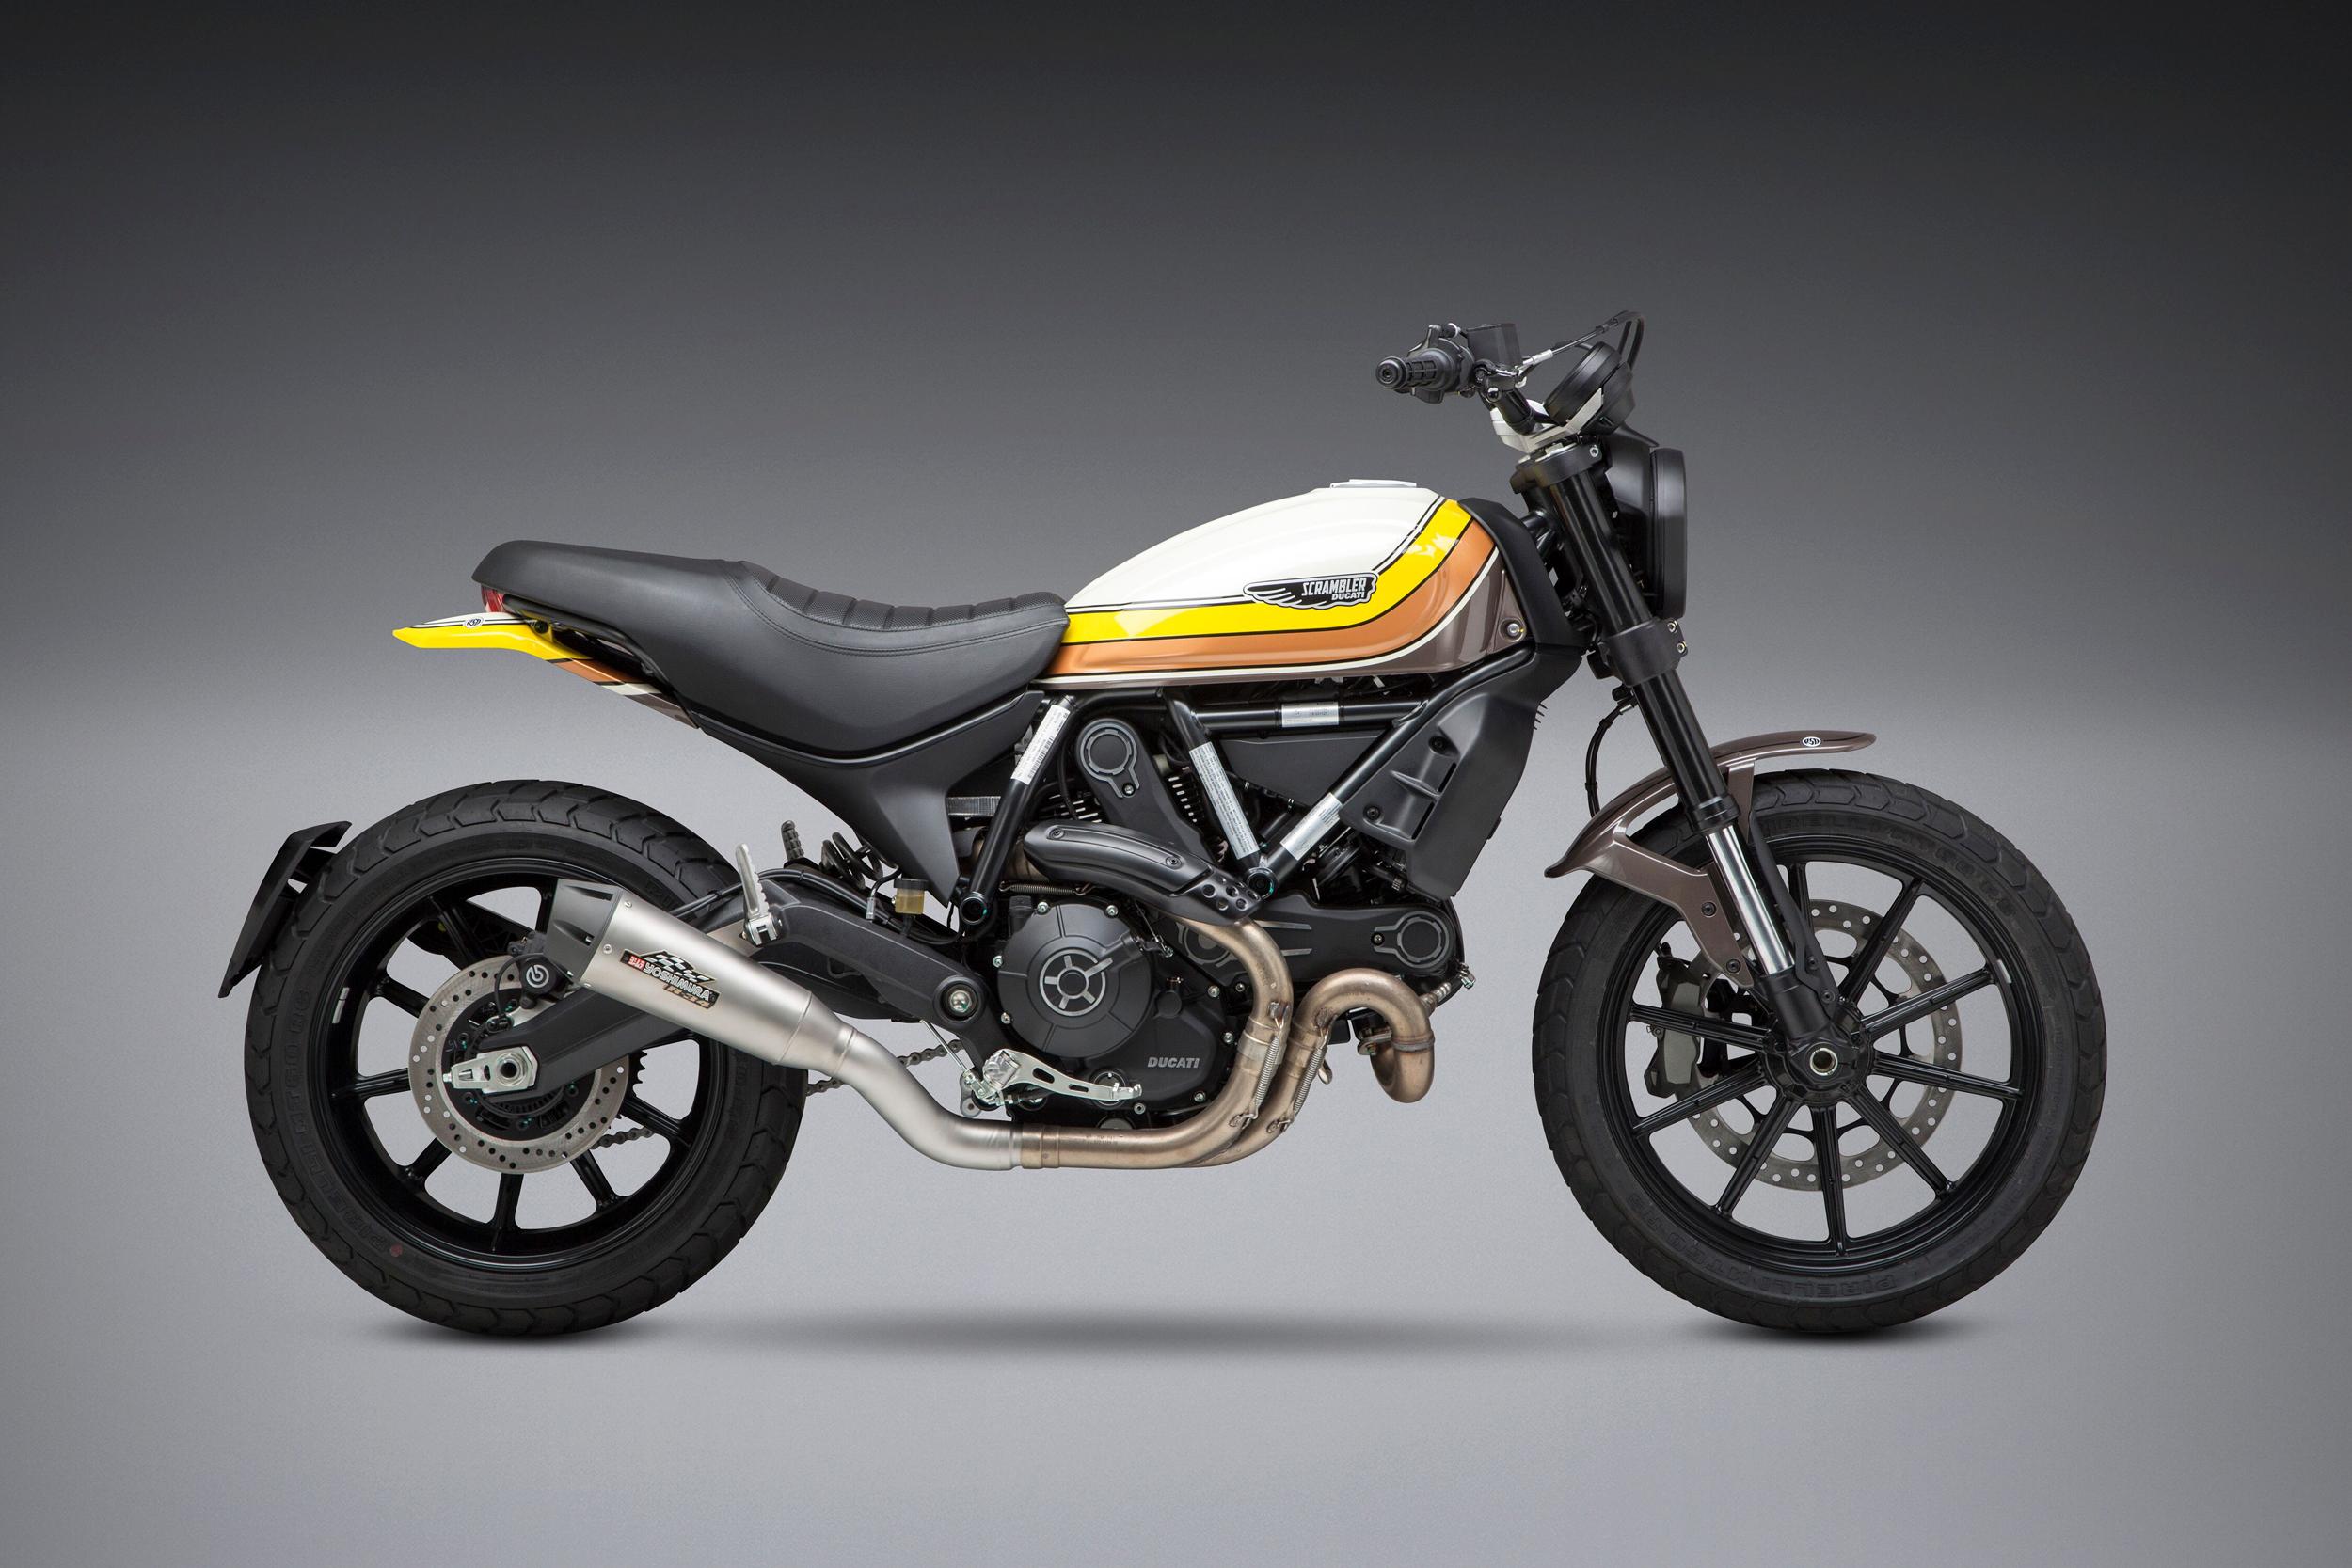 Yoshimura Introduces 2019 Ducati Scrambler Race Series Slip-on